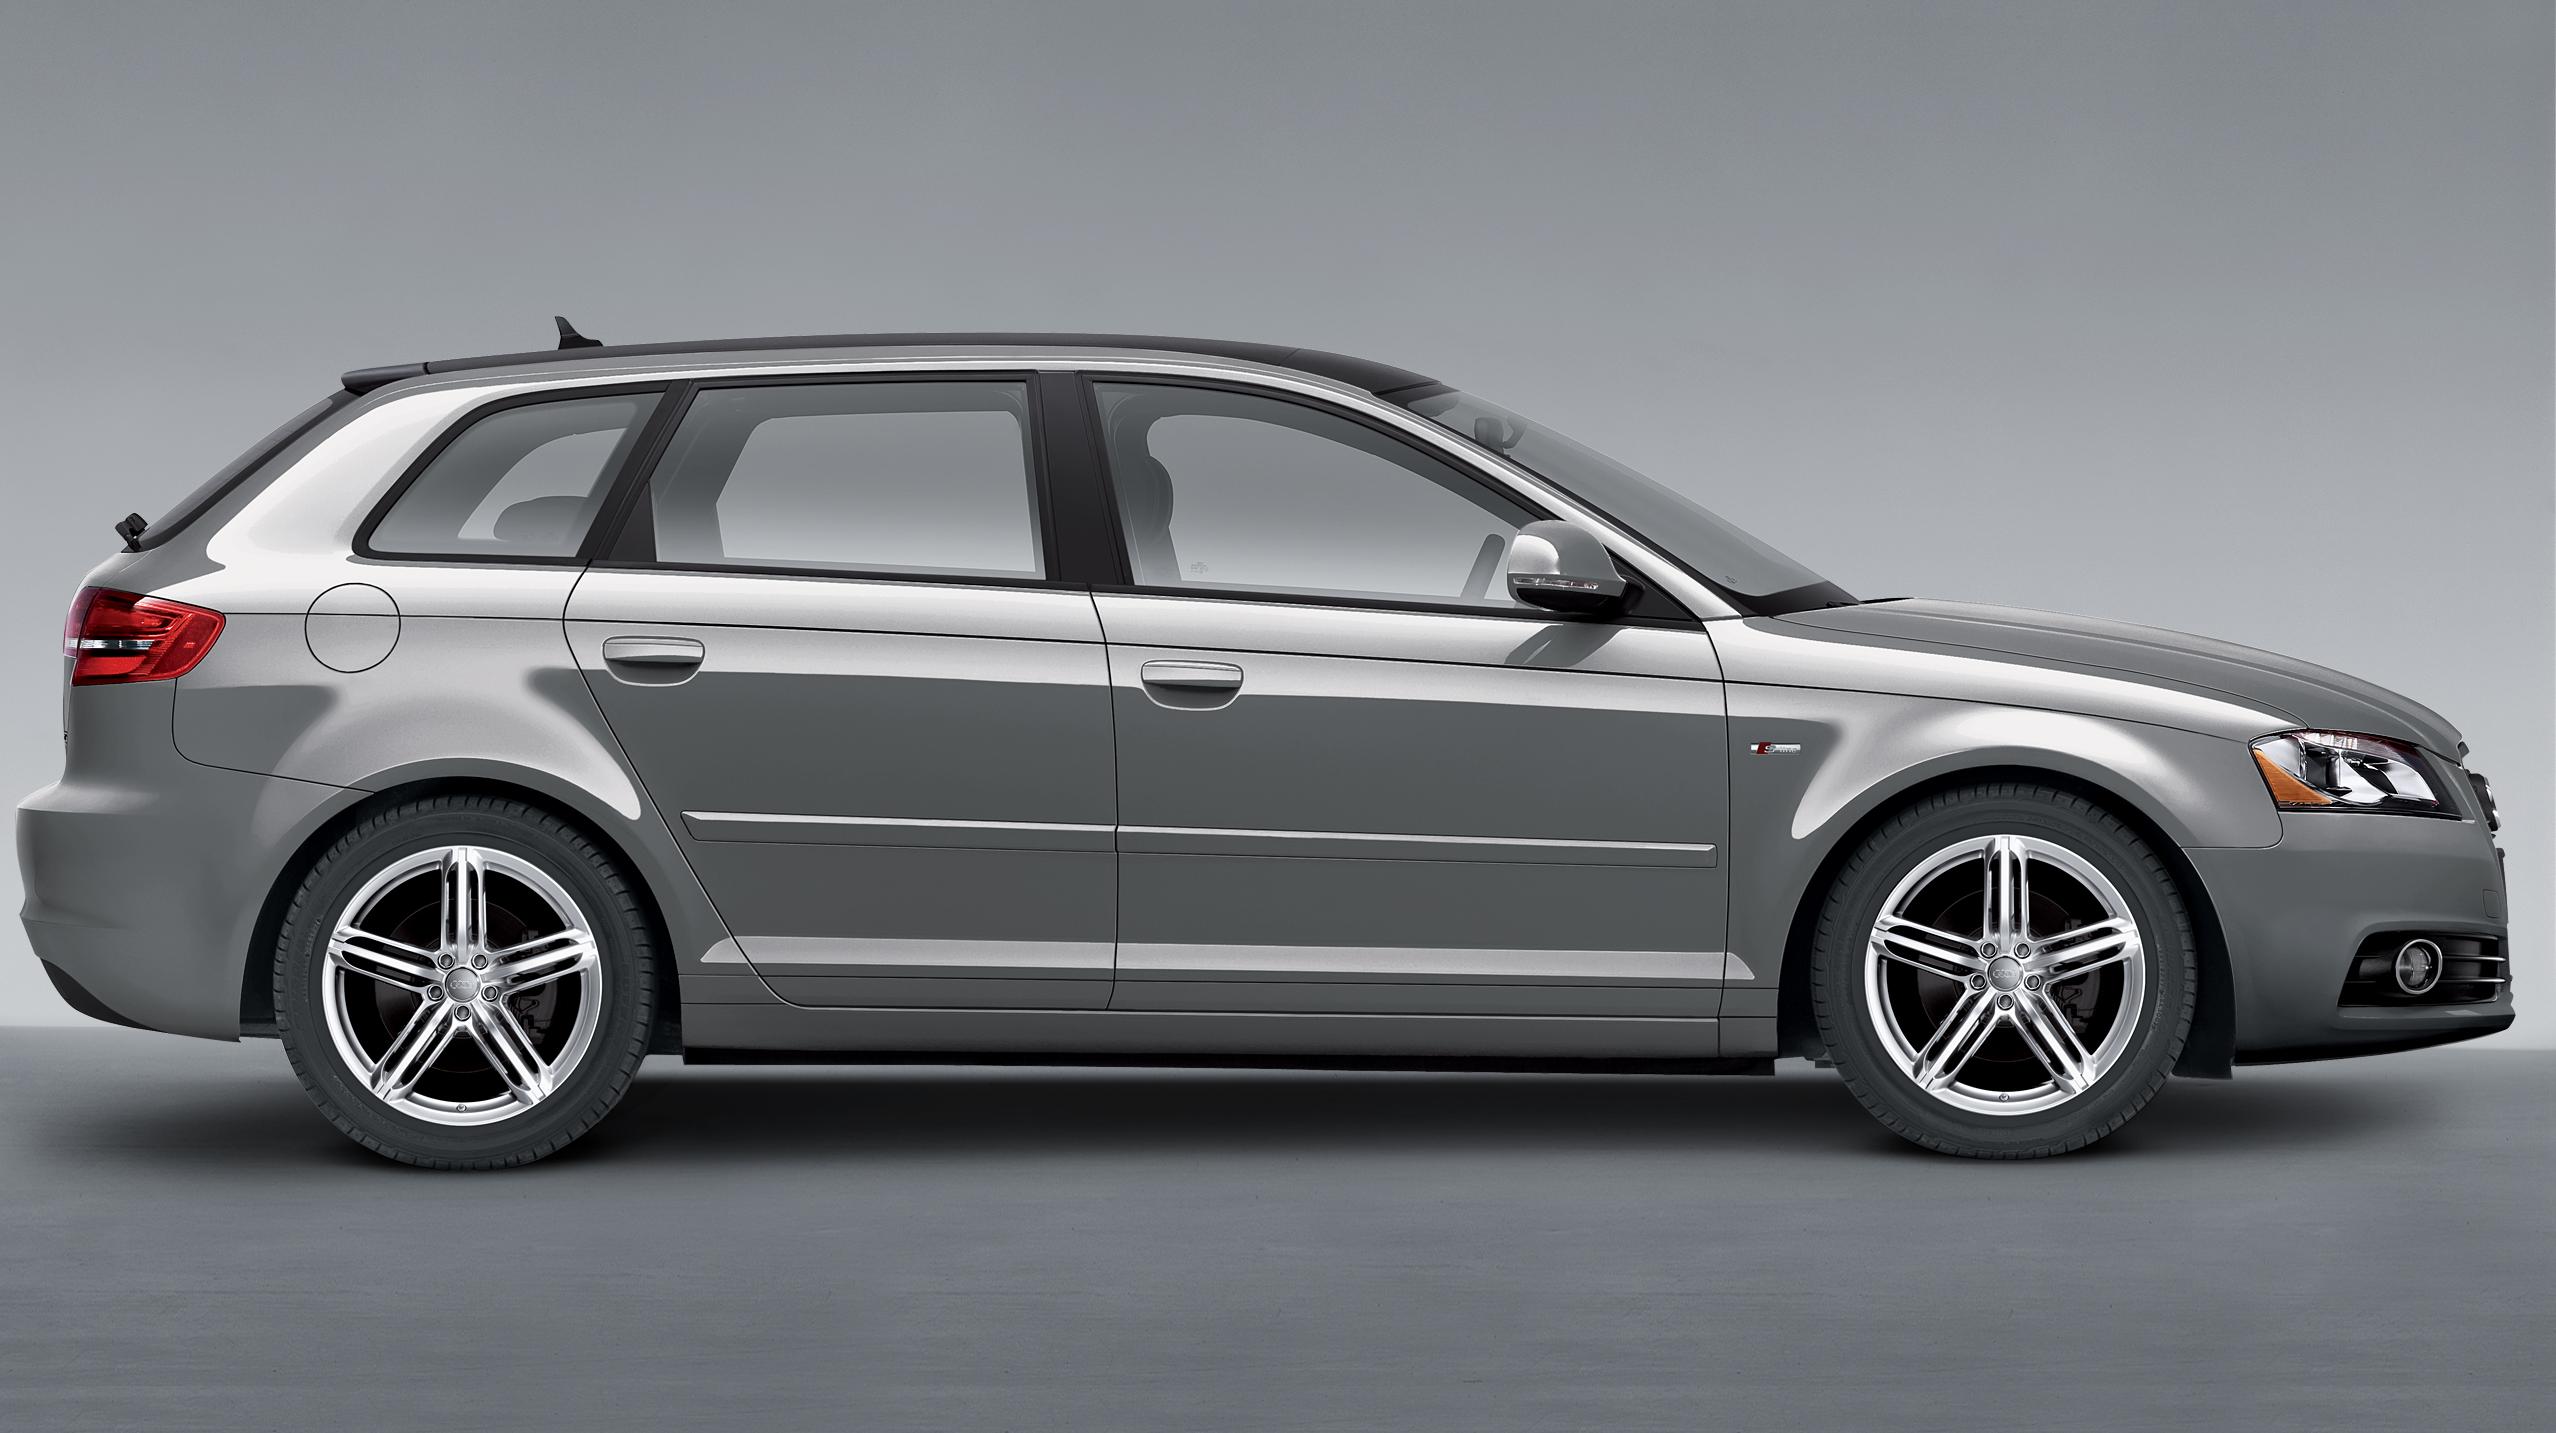 2012 Audi A3 Image 12